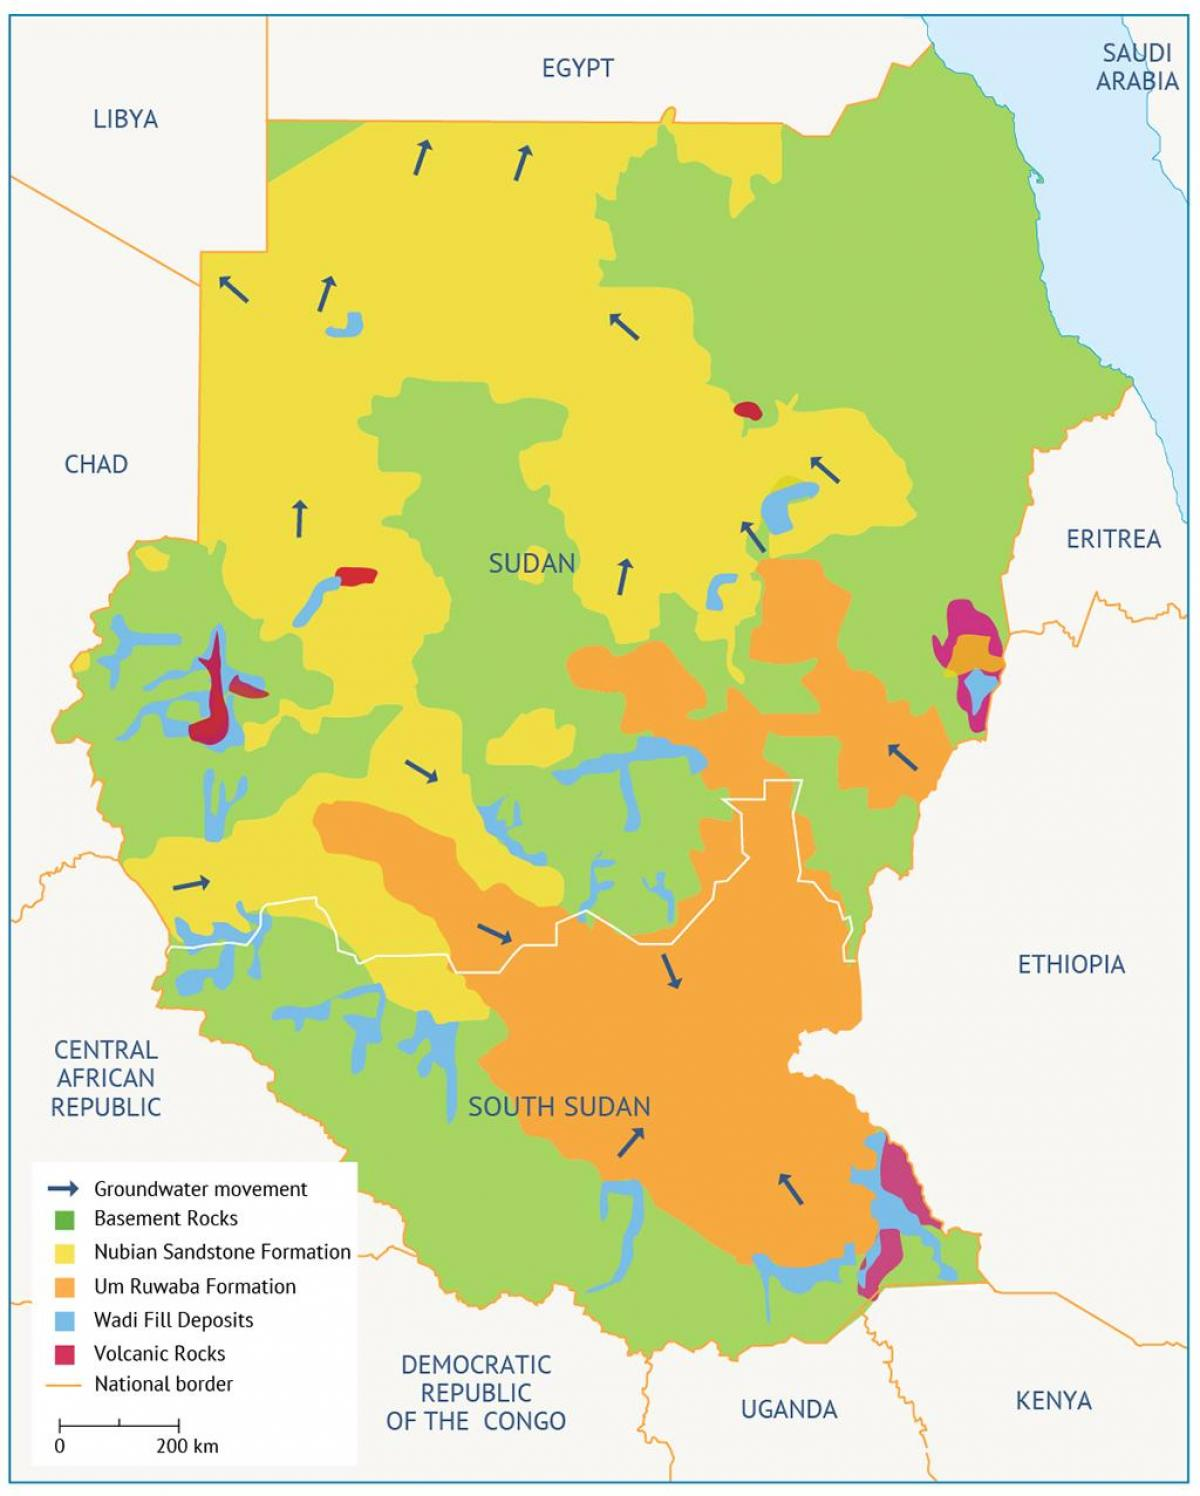 Sudan basin map - Map of Sudan basin (Northern Africa - Africa)